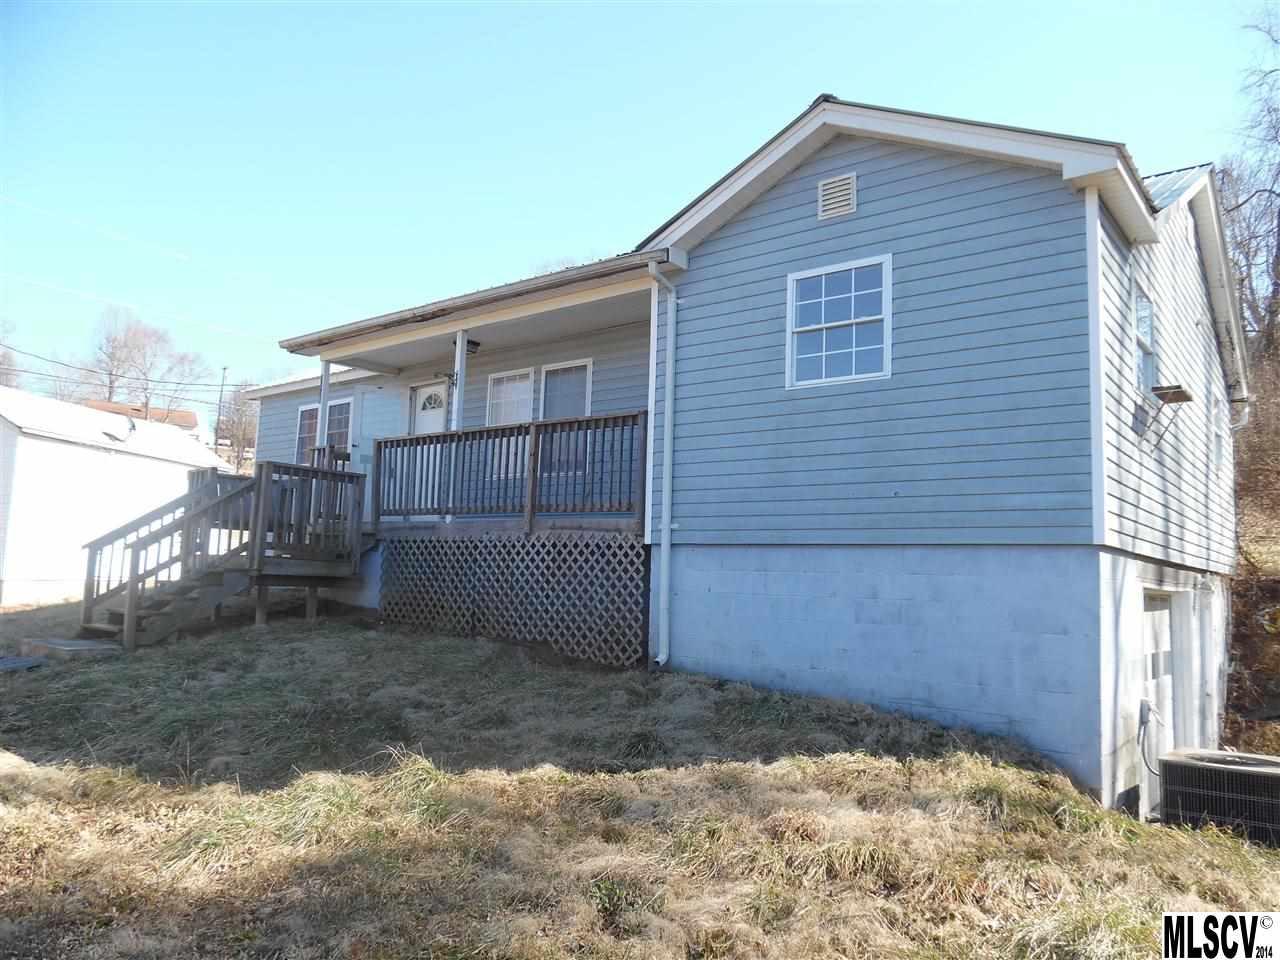 Real Estate for Sale, ListingId: 31954898, Lenoir,NC28645